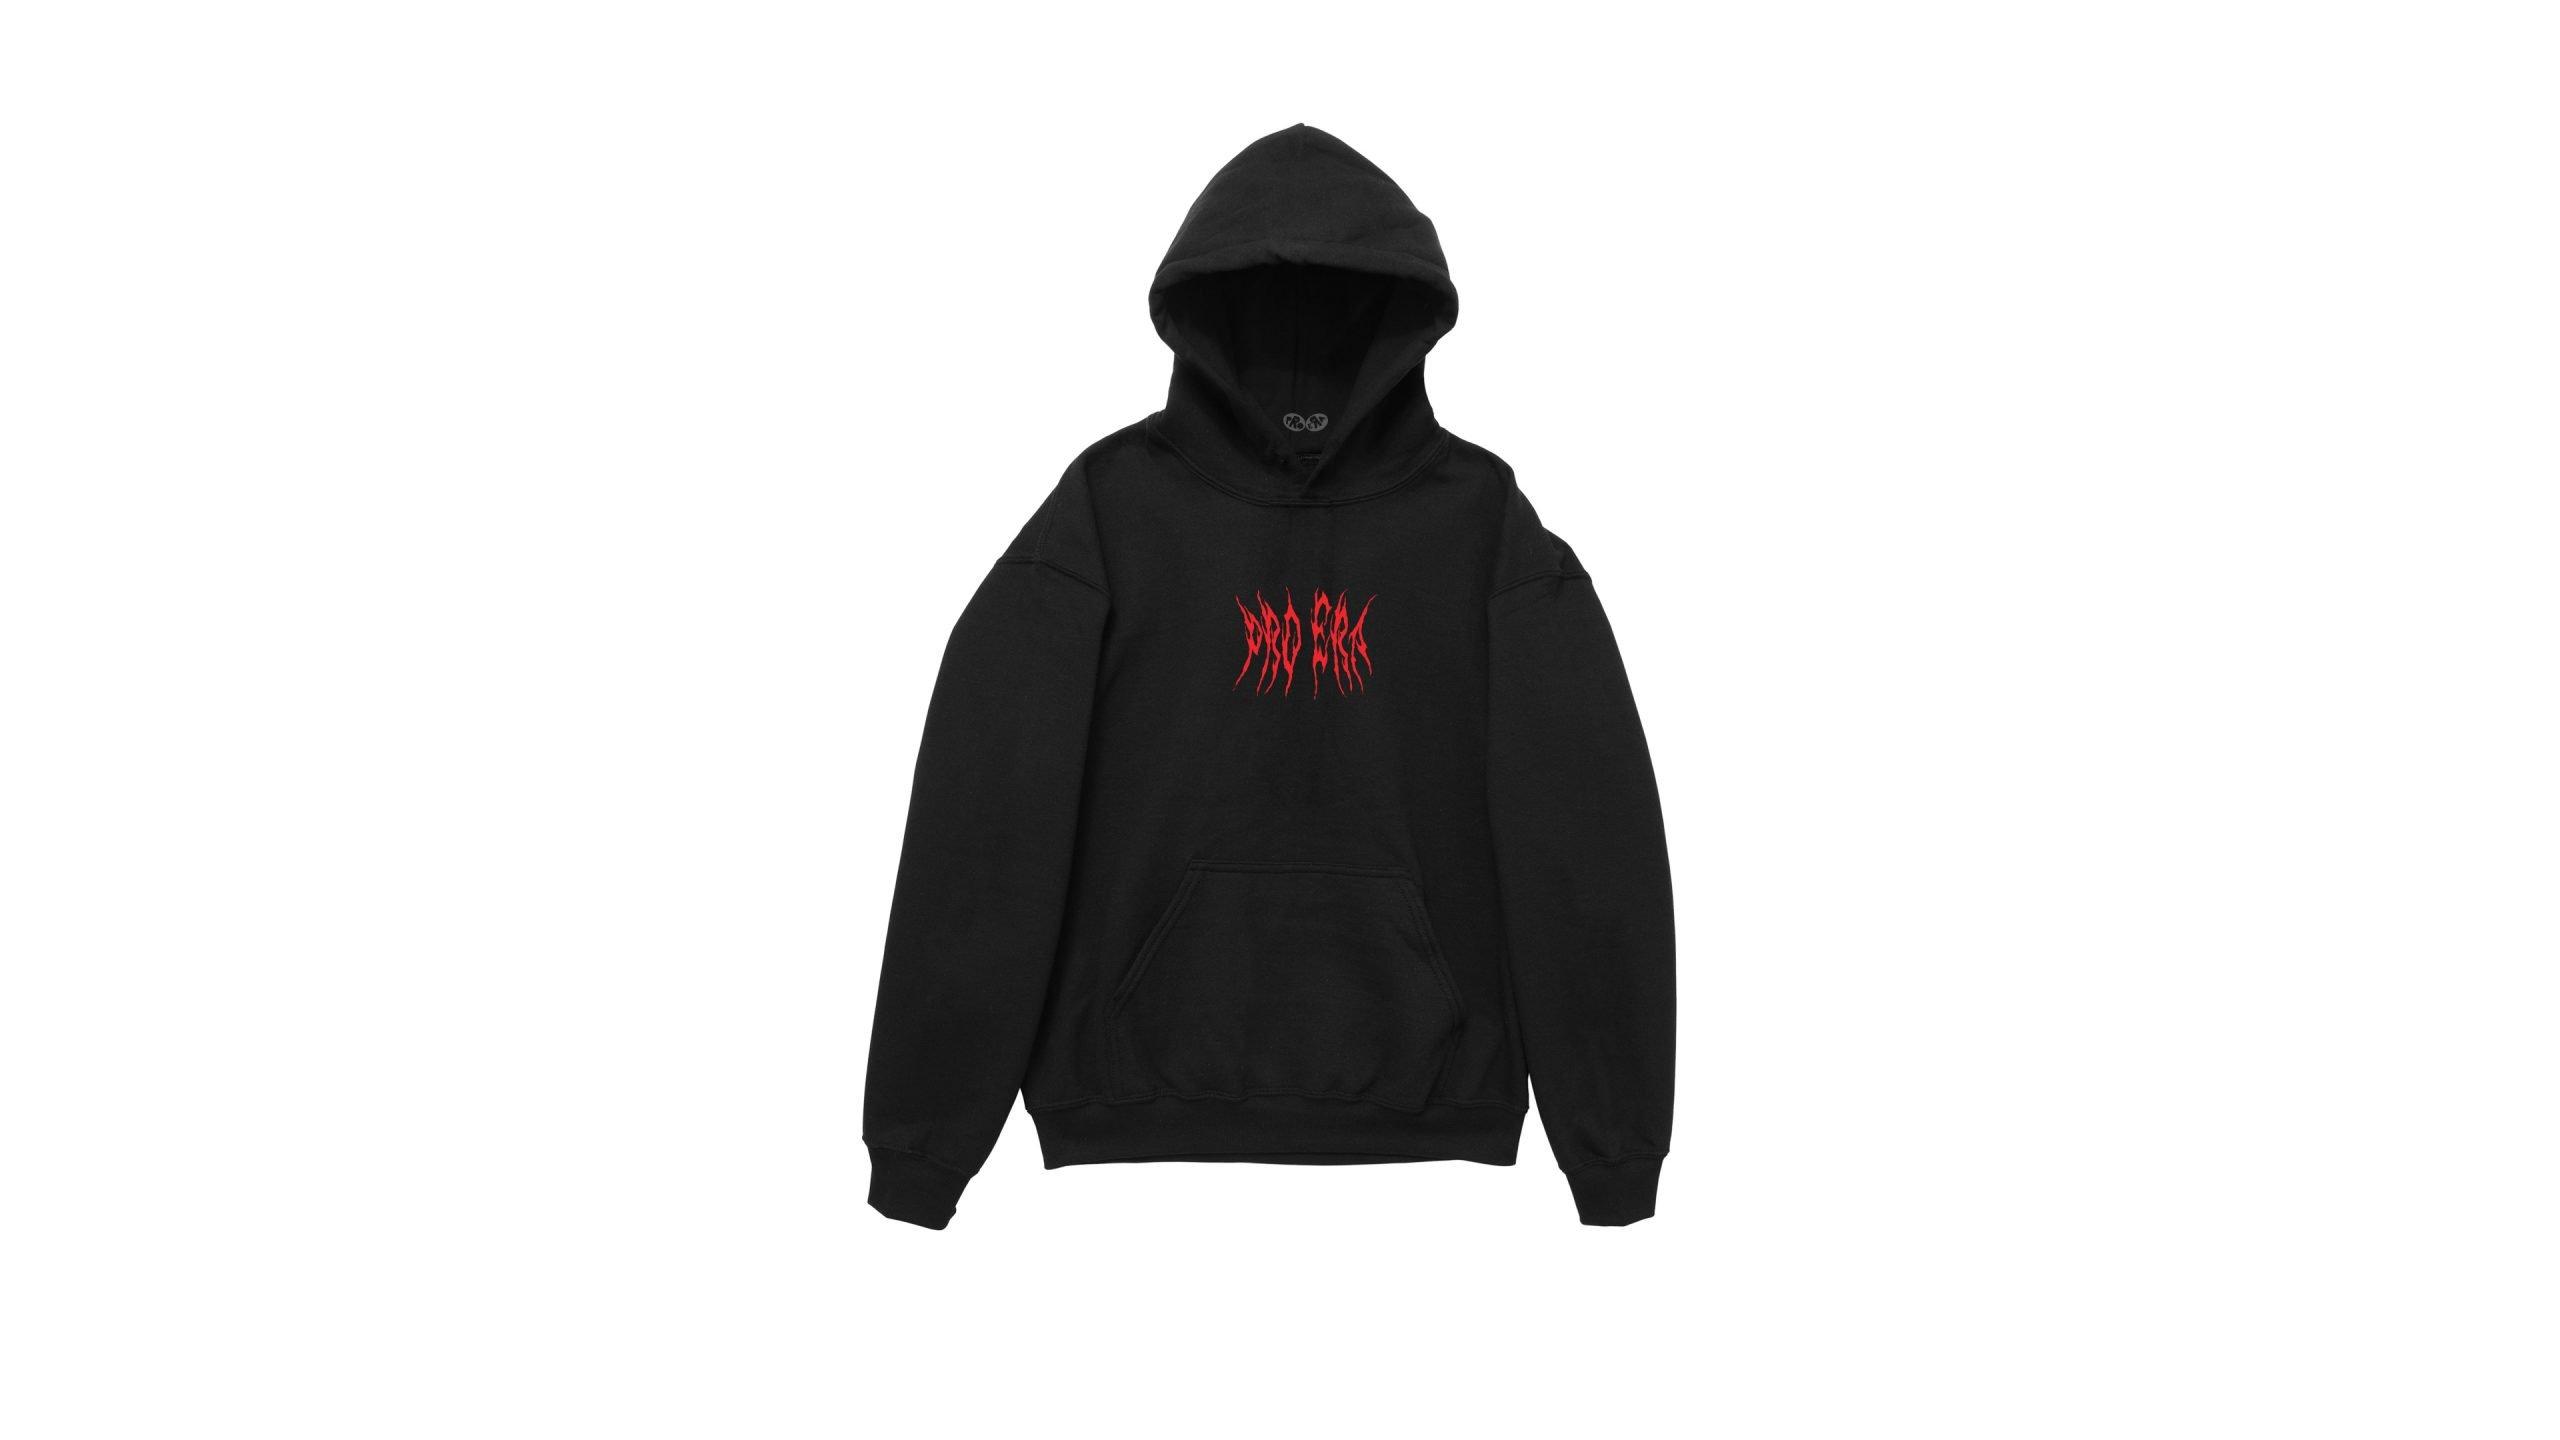 PRO-ERA-design-05-hoodie-front